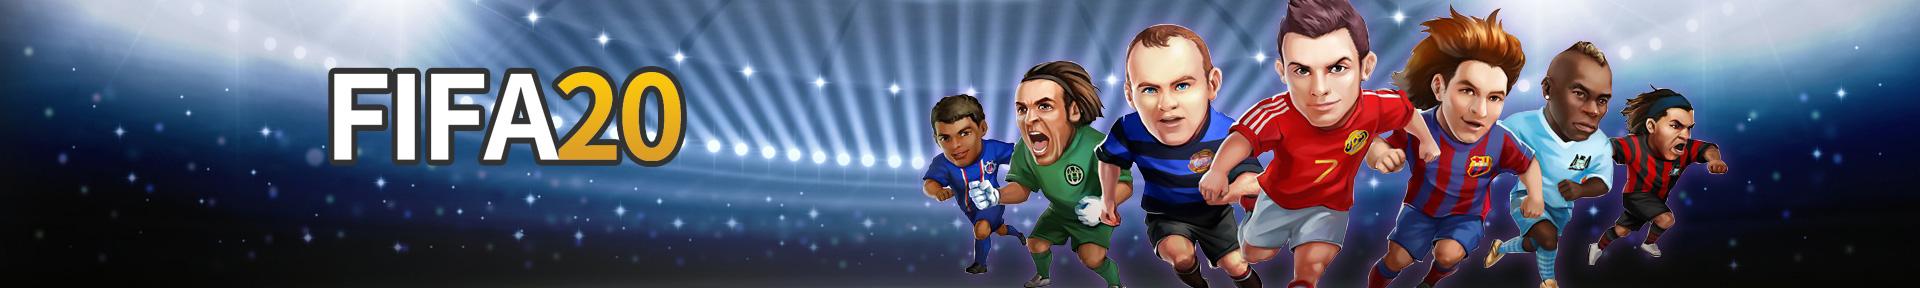 FIFA 20 Comfort Trade